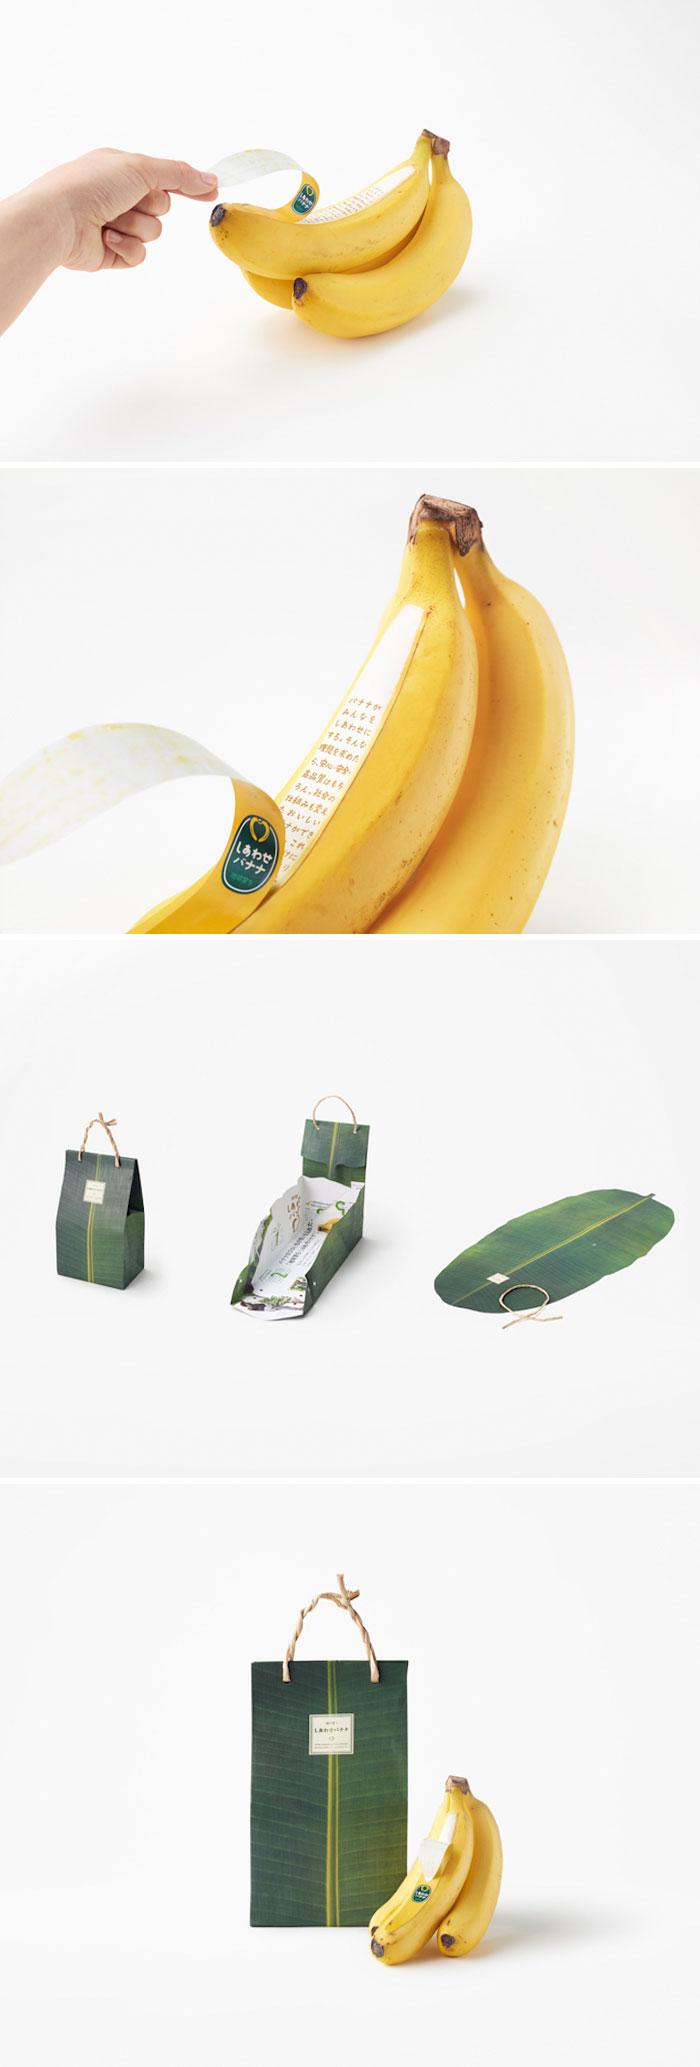 167. Этикетка для банана